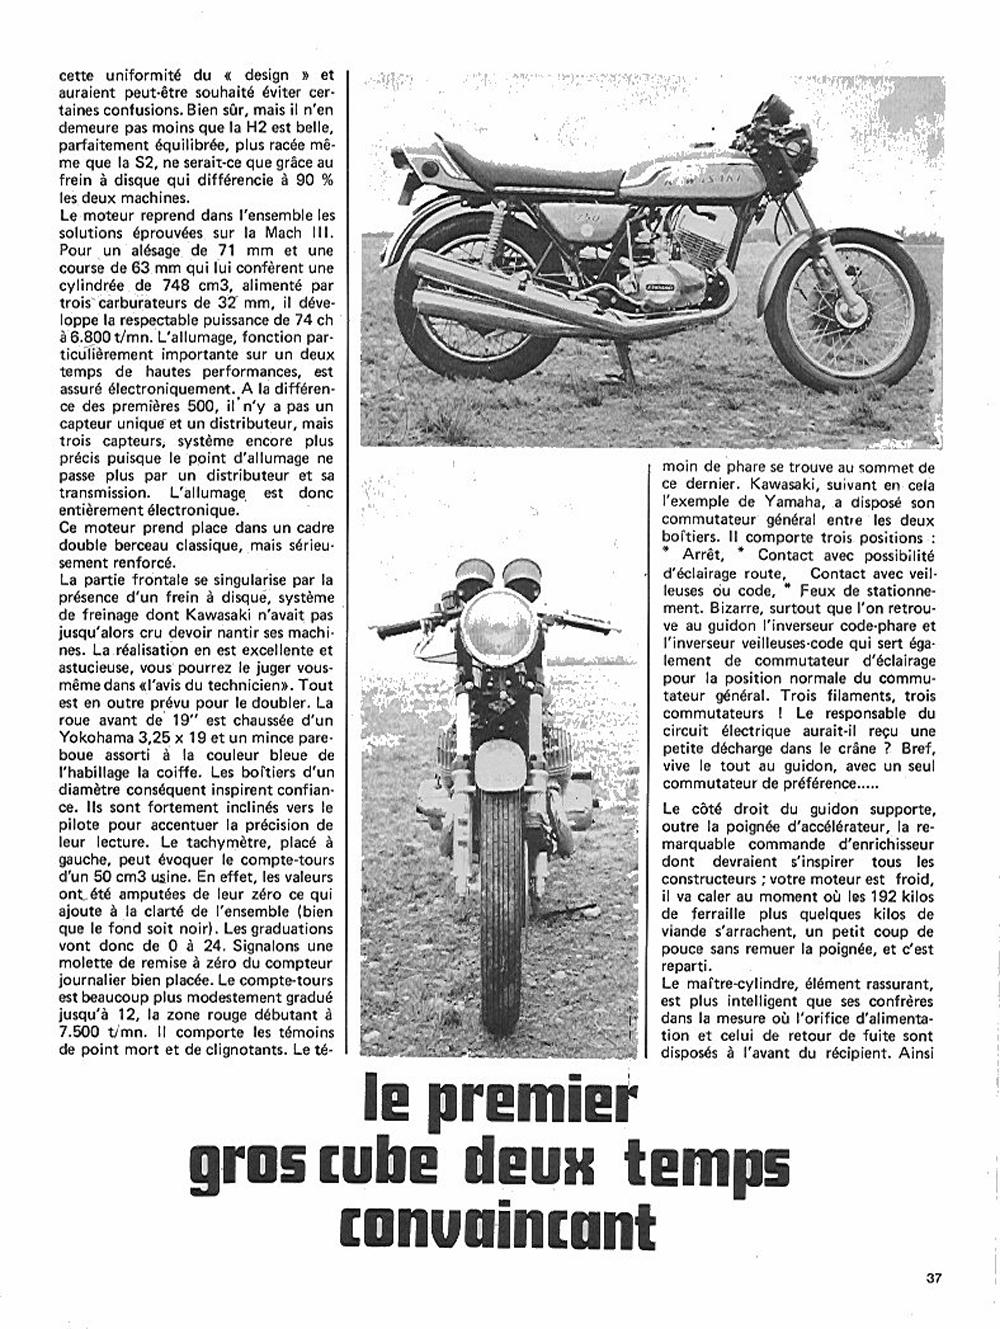 1972 Kawasaki H2 750 road test france 02.jpg